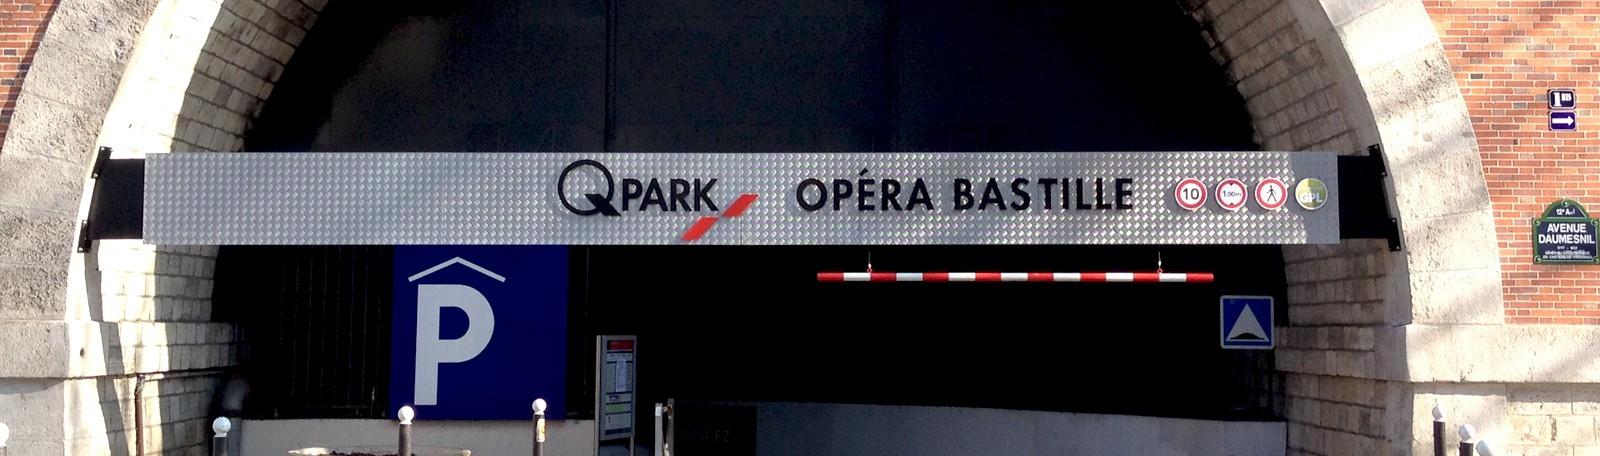 Parking Opéra Bastille - Parkeren in Parijs | Q-Park